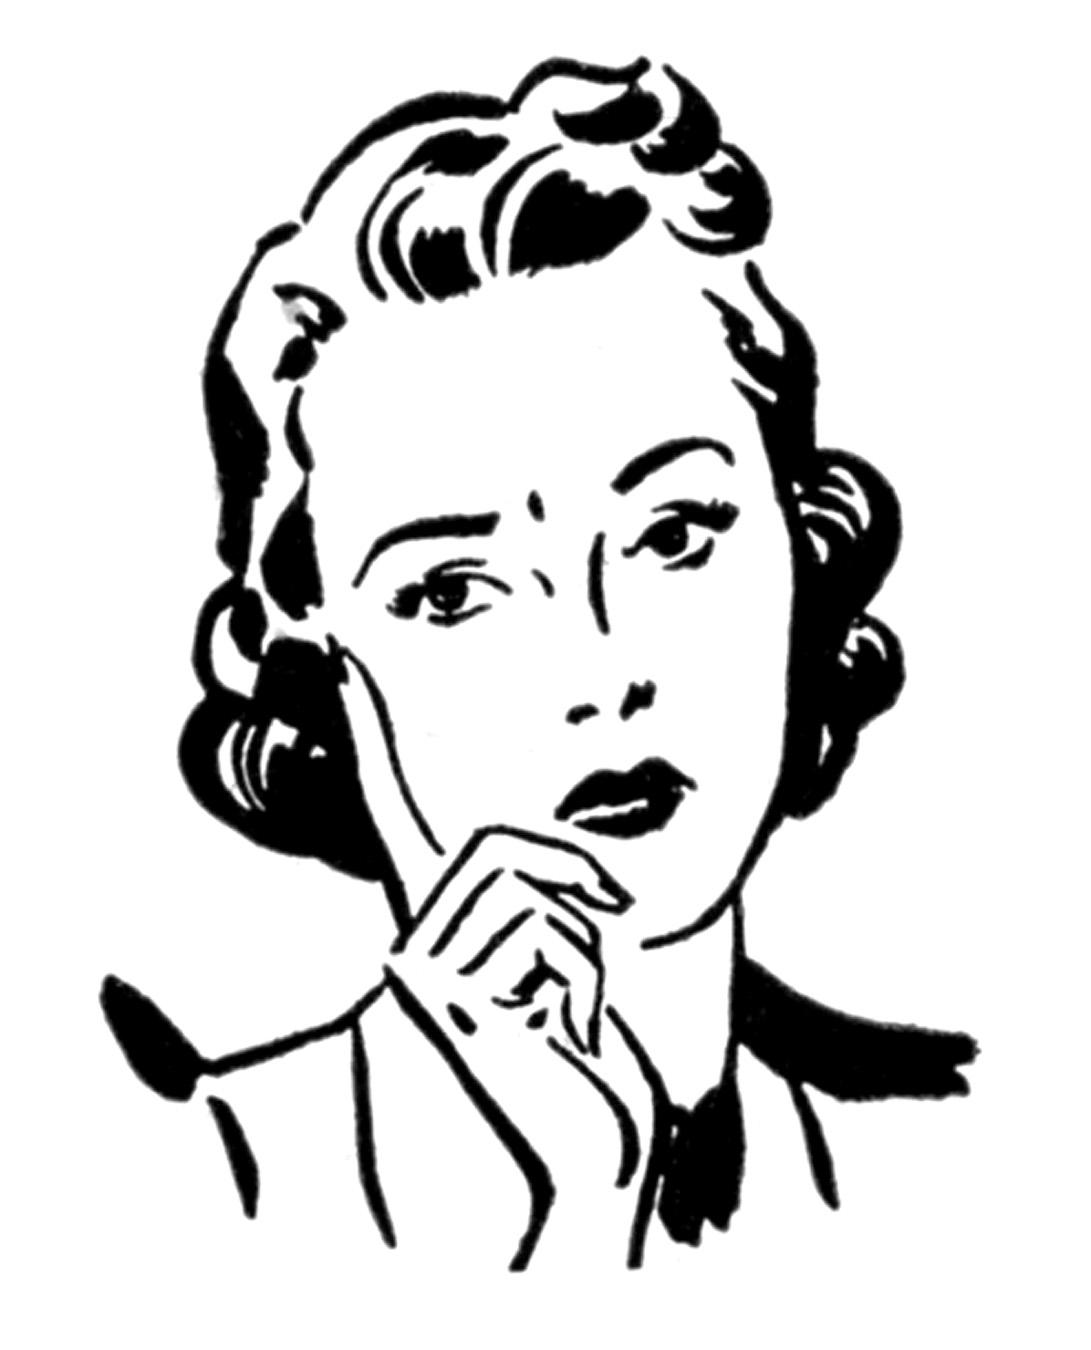 Retro Clip Art - Money Moms - Women - The Graphics Fairy